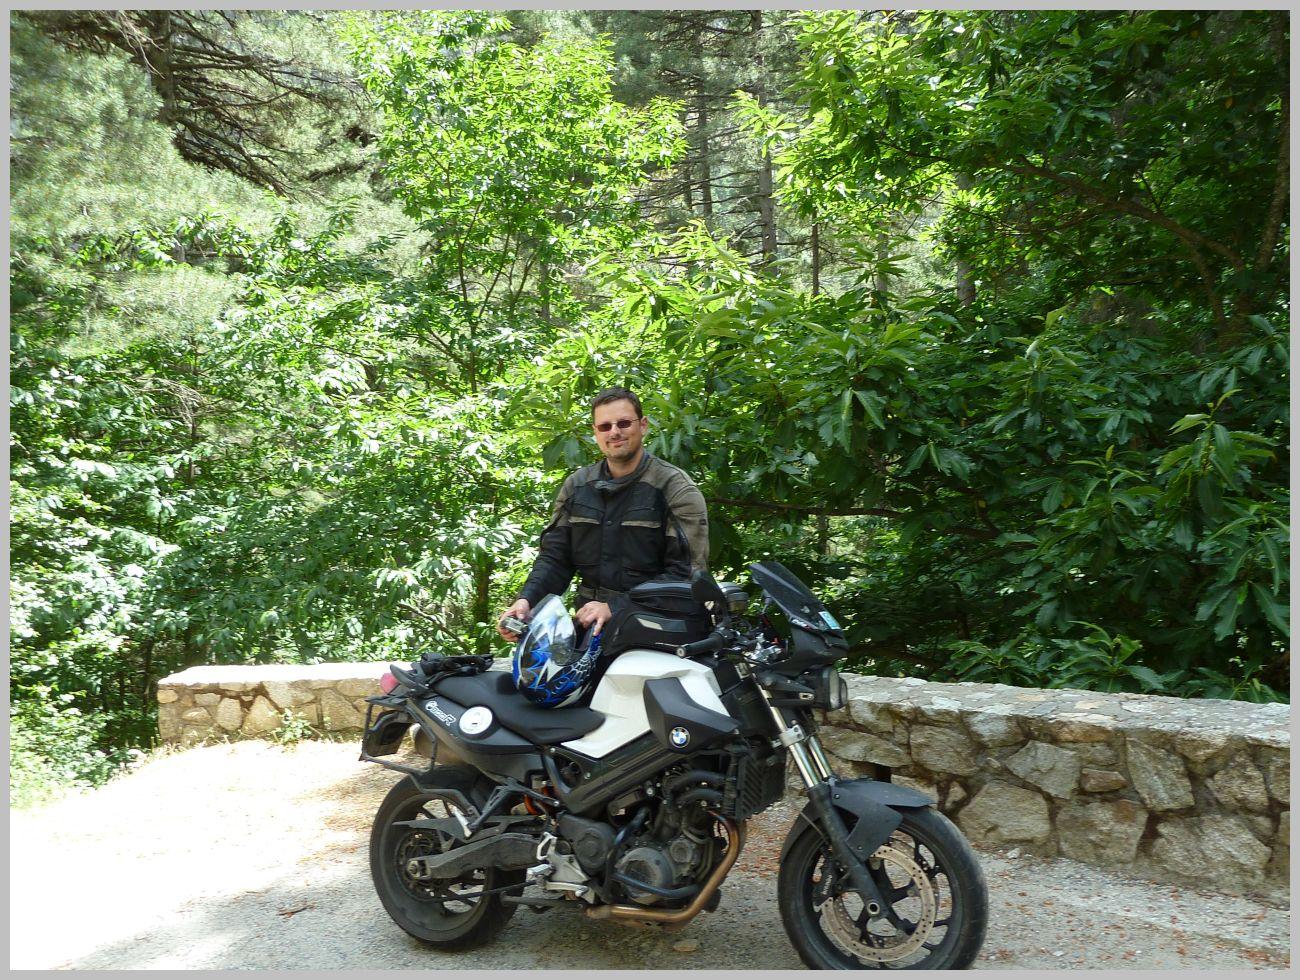 201206_Korsika_Moped112